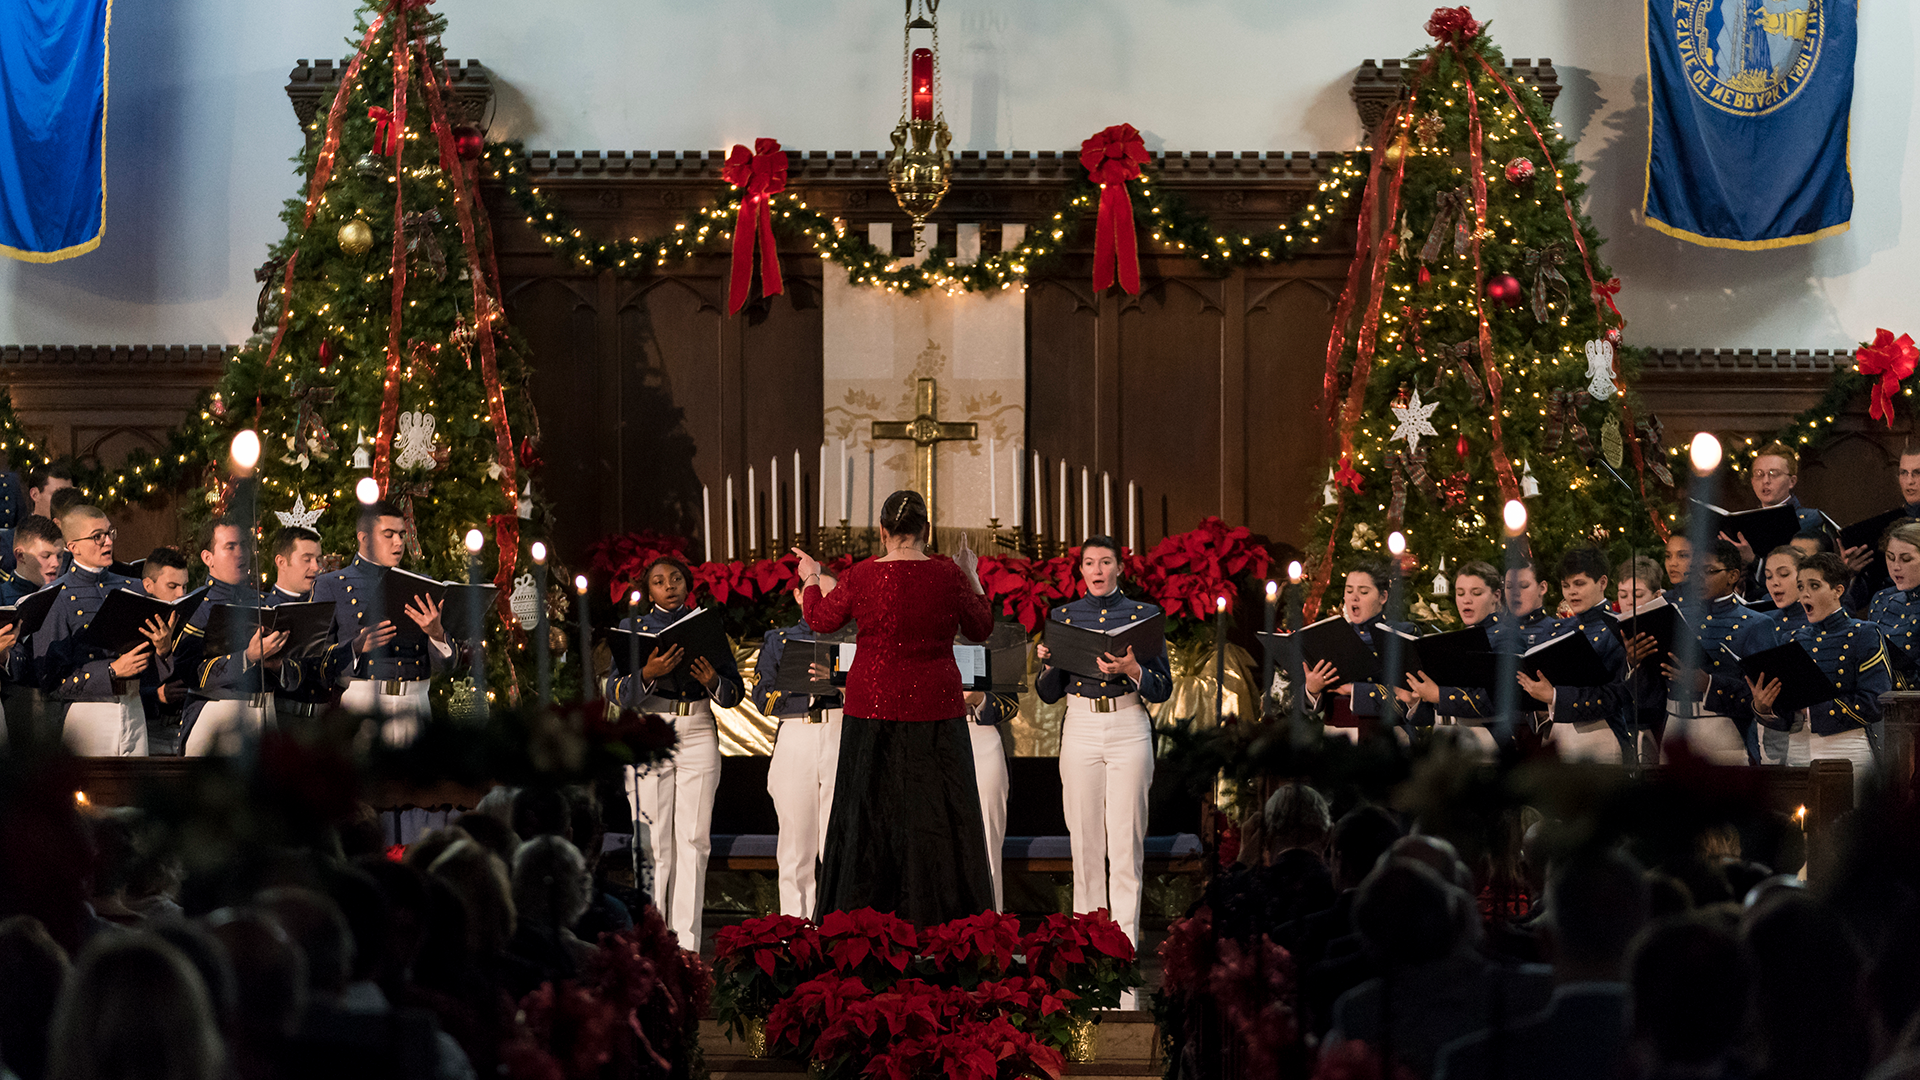 Citadel Christmas Mass 2020 Upcoming news from The Citadel – November and December 2018 | The